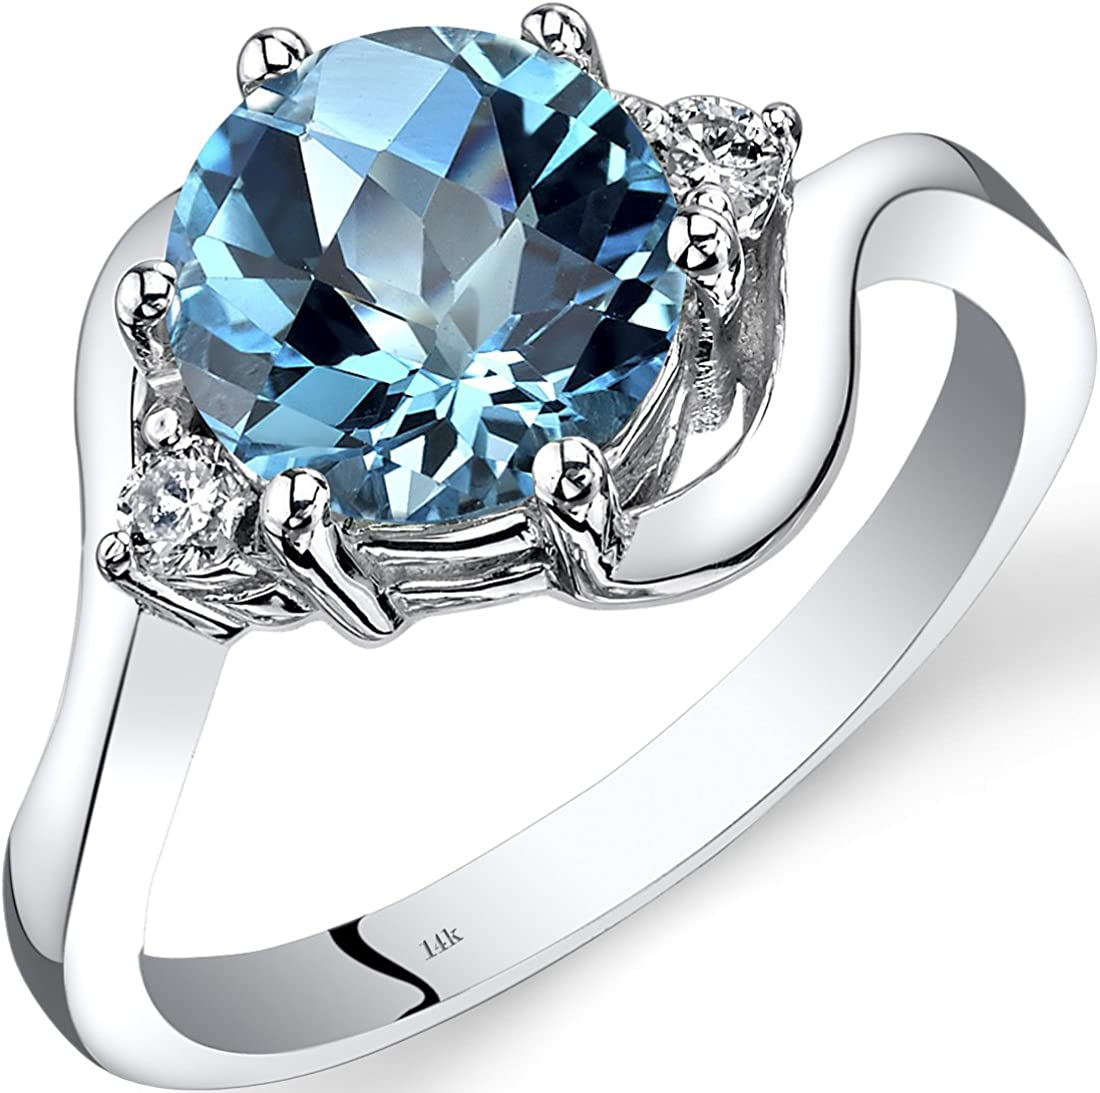 Amazon Com 14k White Gold Swiss Blue Topaz Diamond 3 Stone Ring 2 25 Carat Jewelry